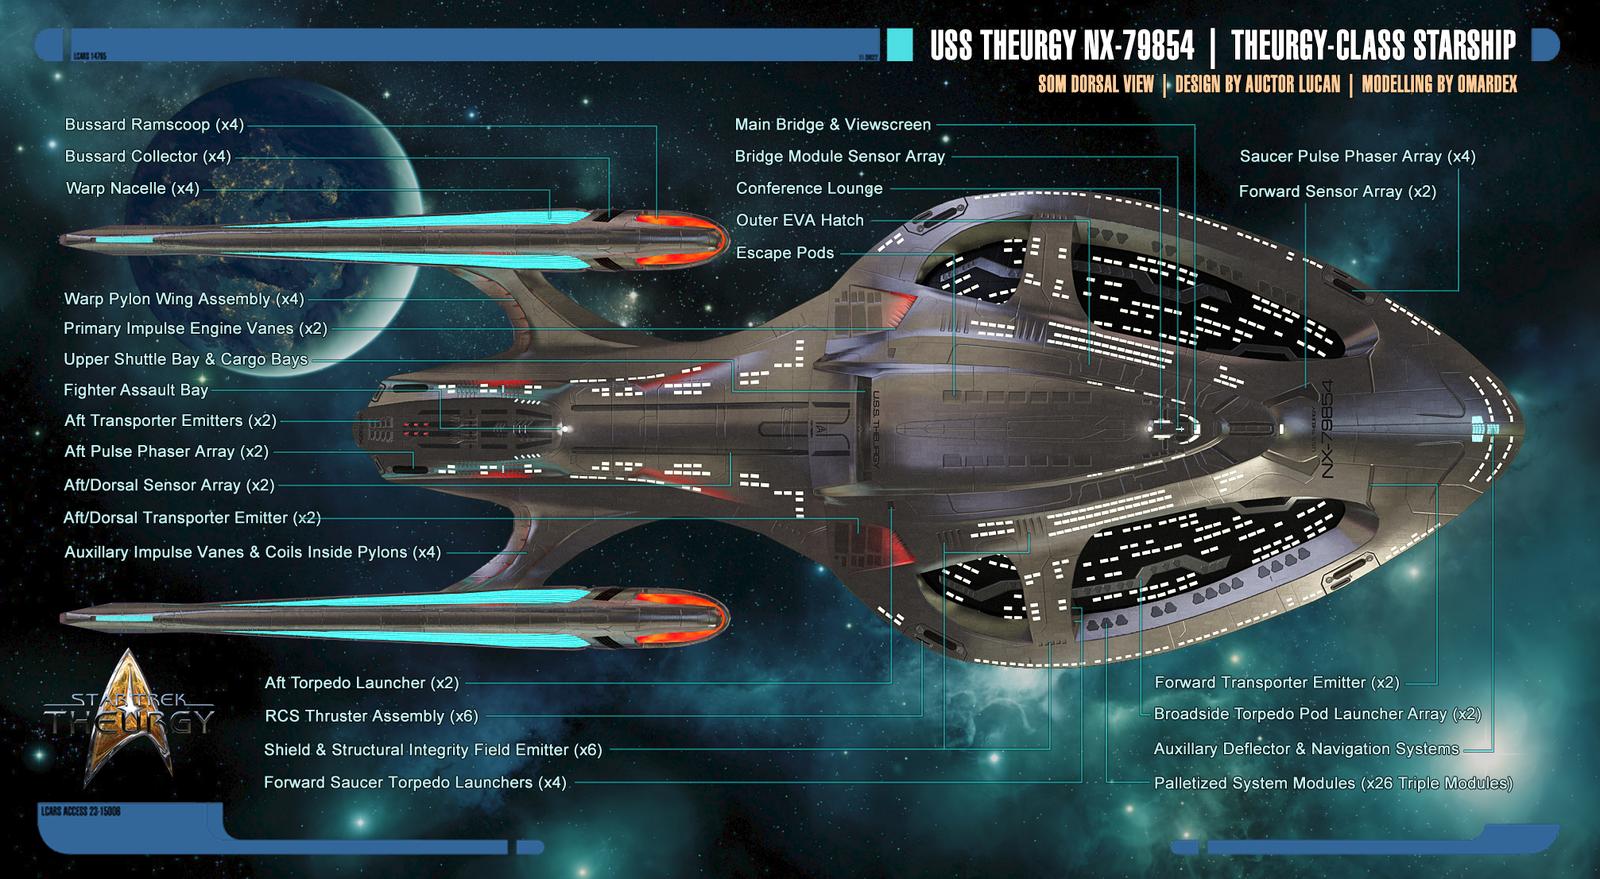 theurgy_class_starship_schematics___dors